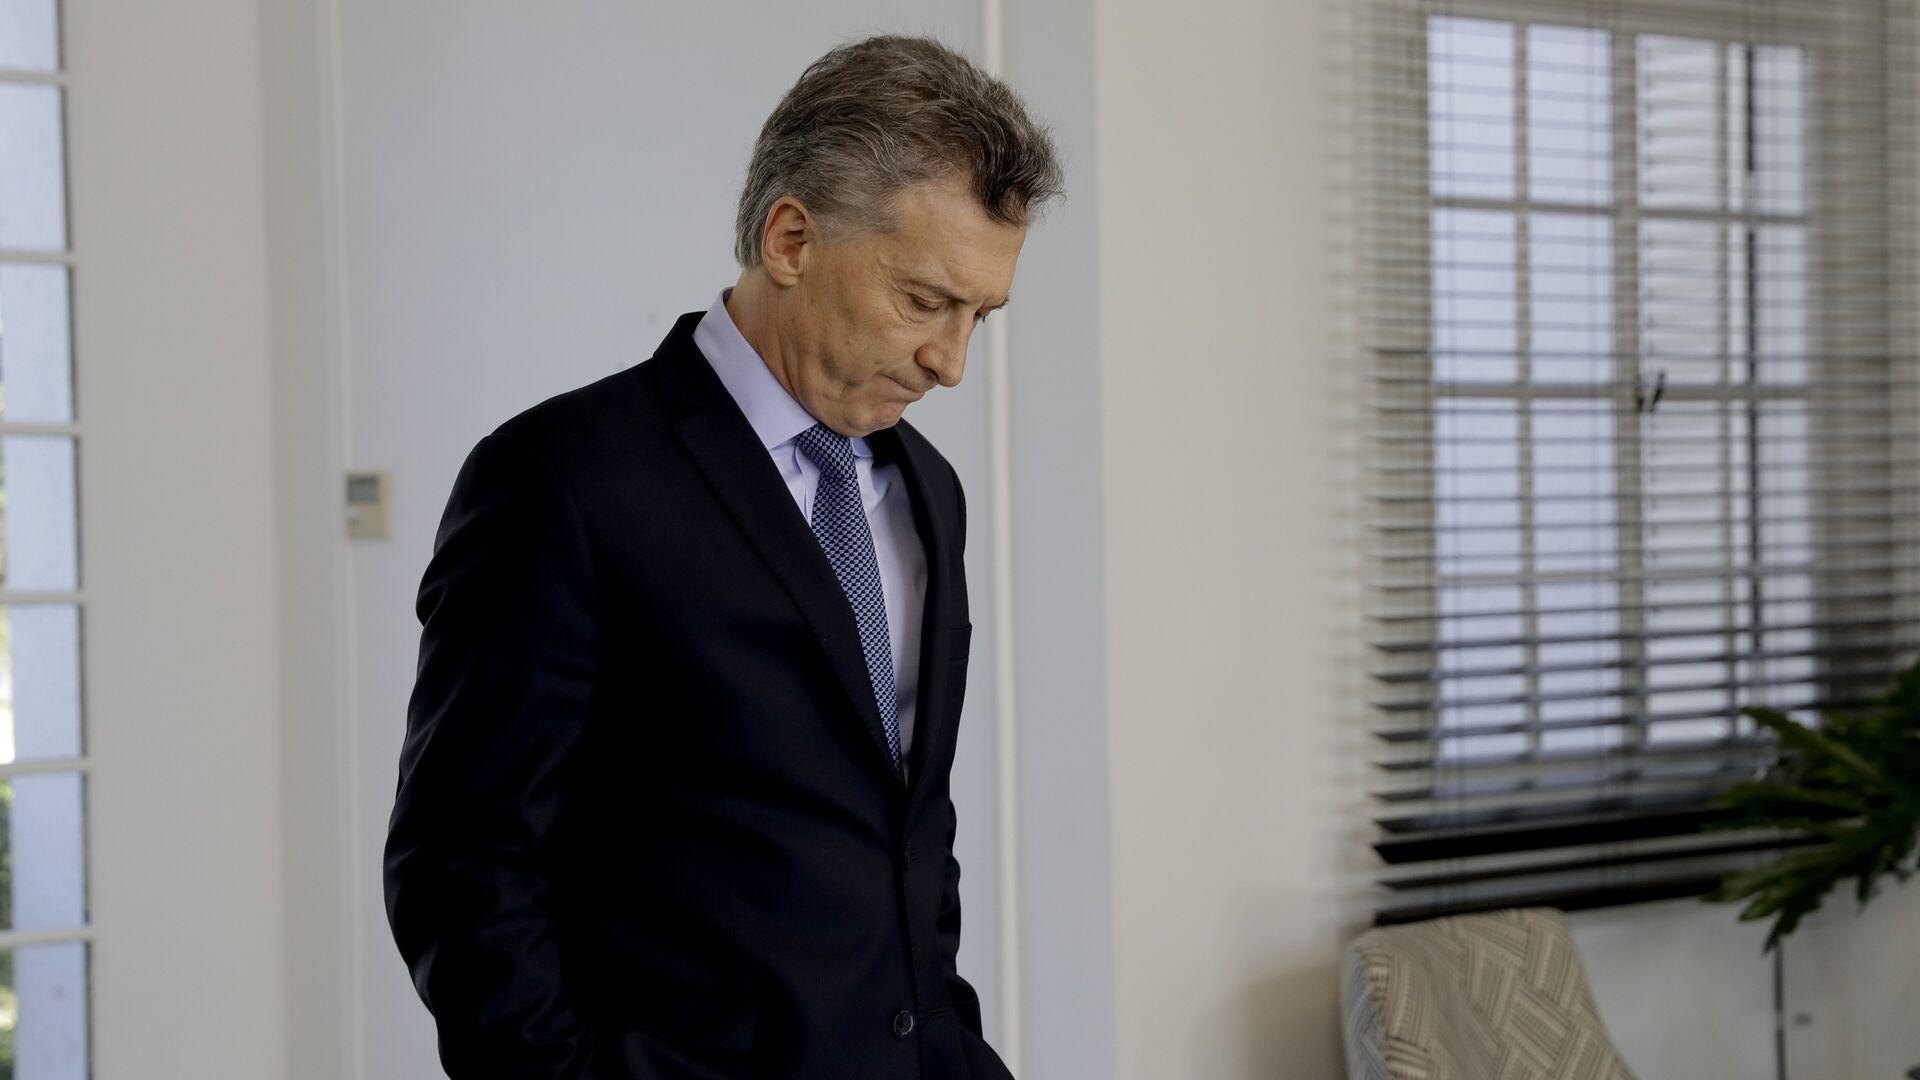 Mauricio Macri, presidente de Argentina - Sputnik Mundo, 1920, 23.03.2021